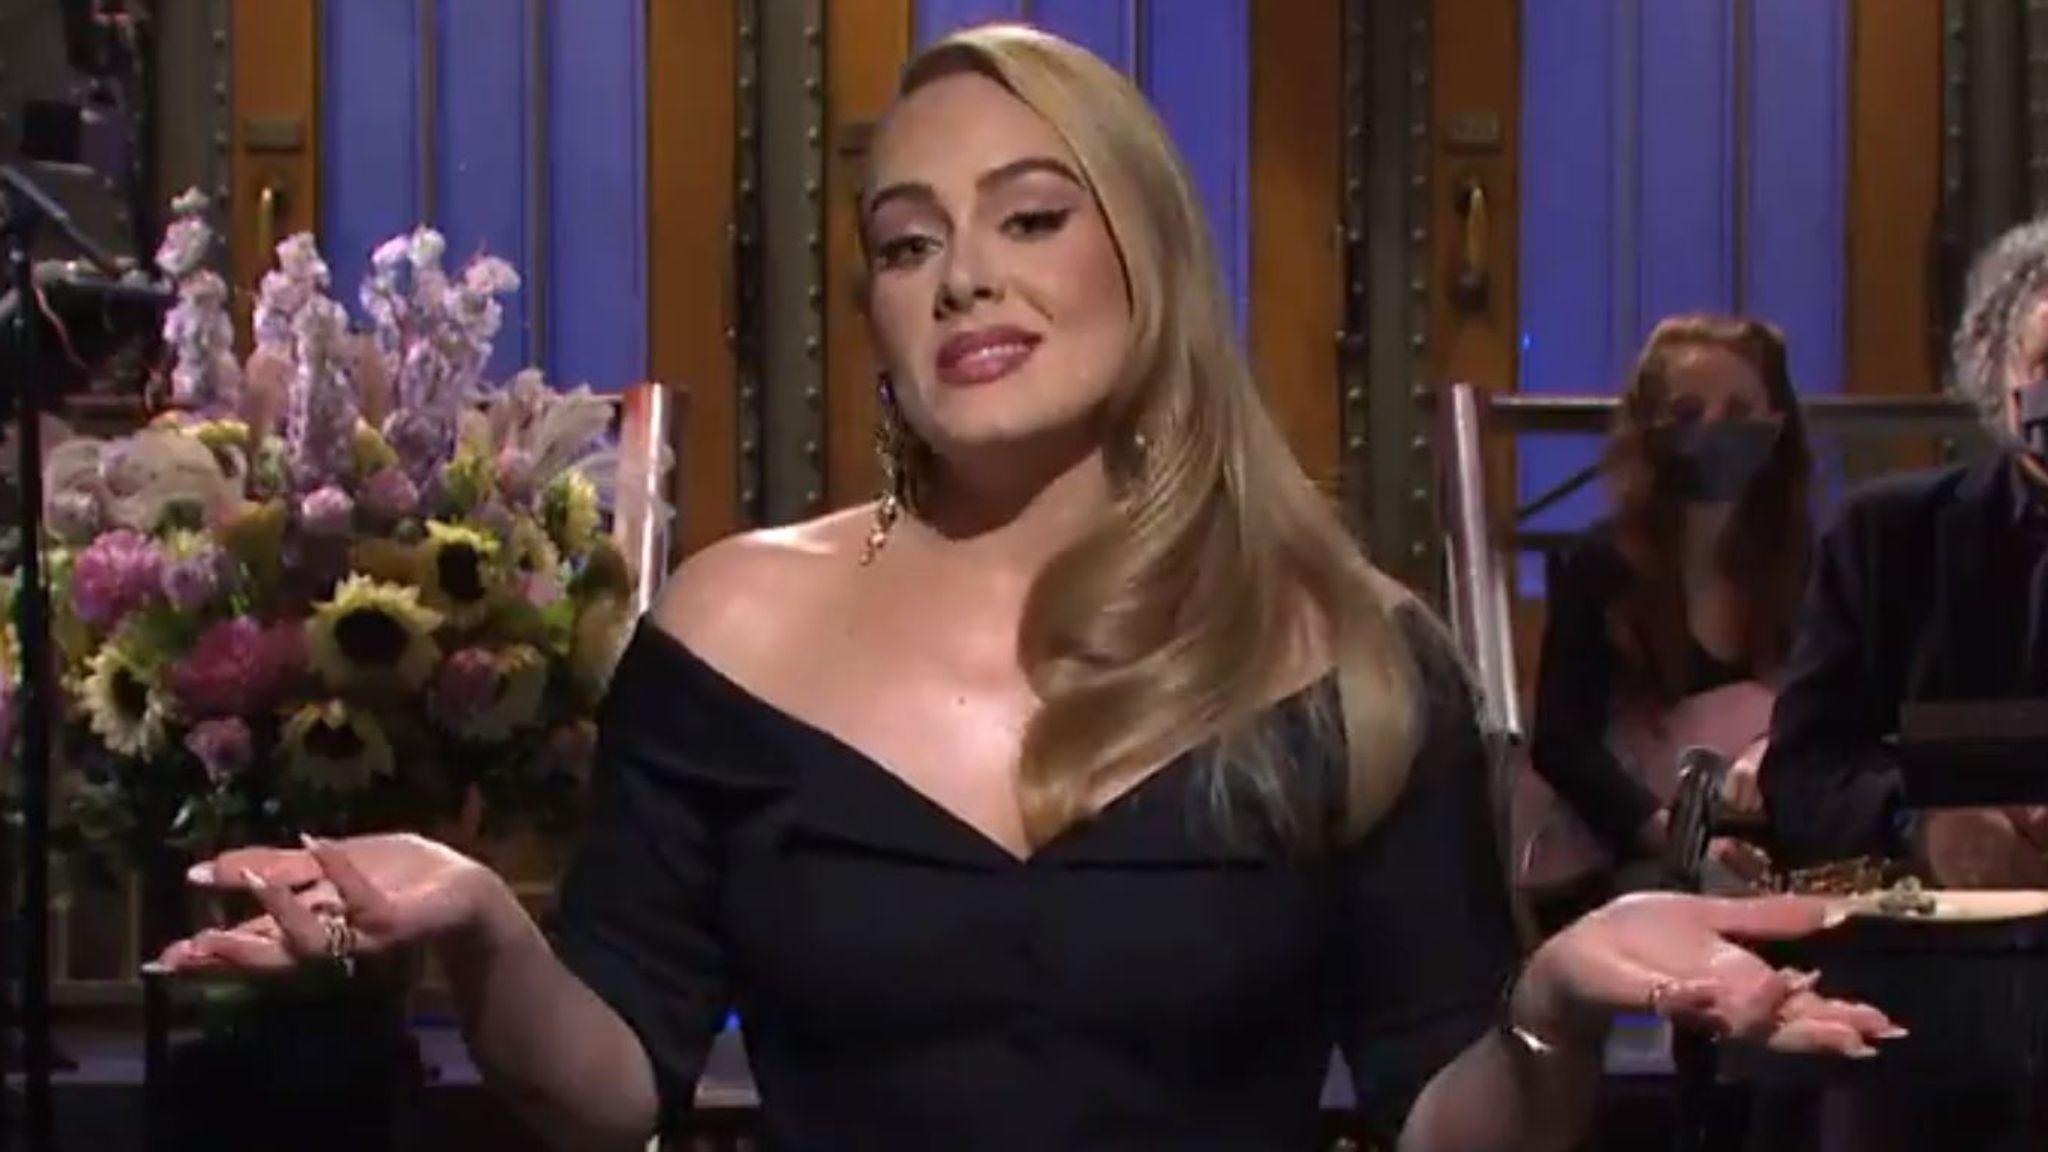 Adele κιλά: Αστειεύεται για την απώλεια των κιλών αλλά δεν μιλά για πολιτική